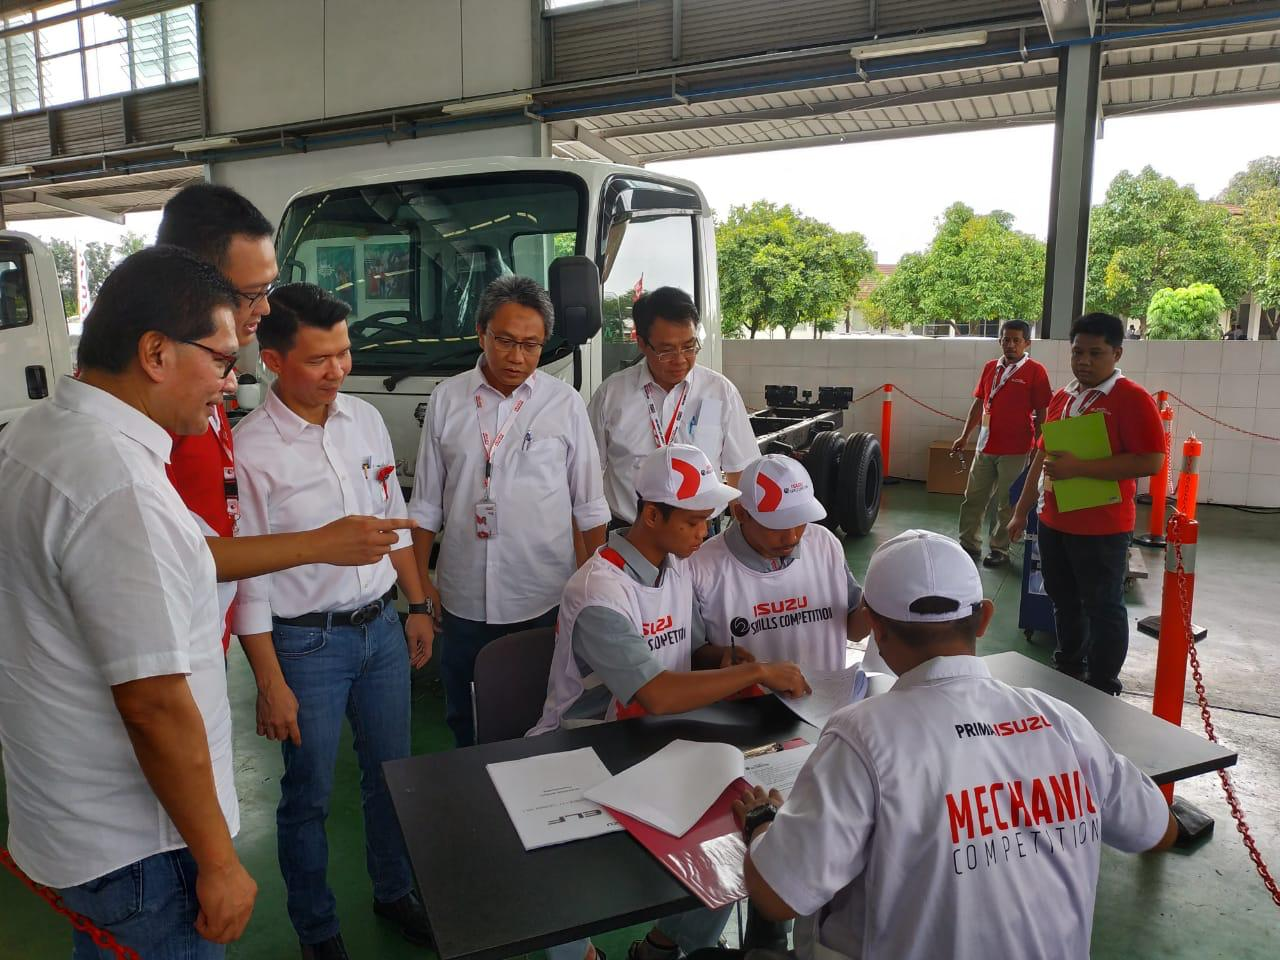 Isuzu Teknisi Skill Kompetisi seluruh Indonesia